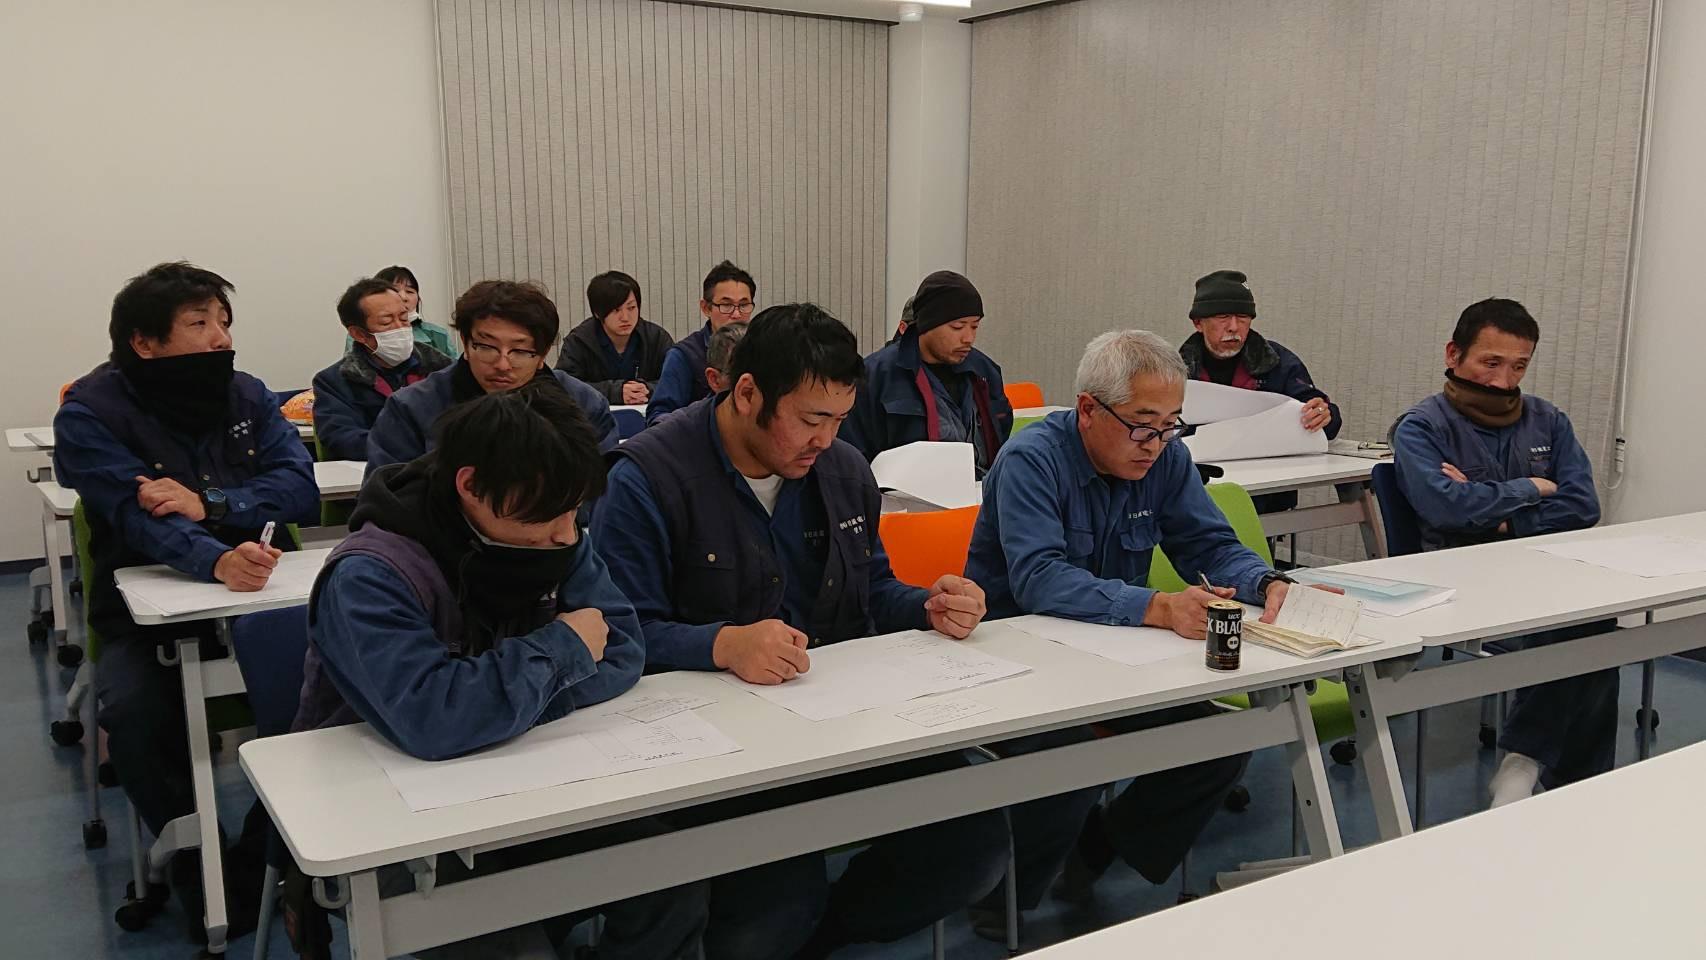 日誠電工2019年12月定例会議_スタッフ写真